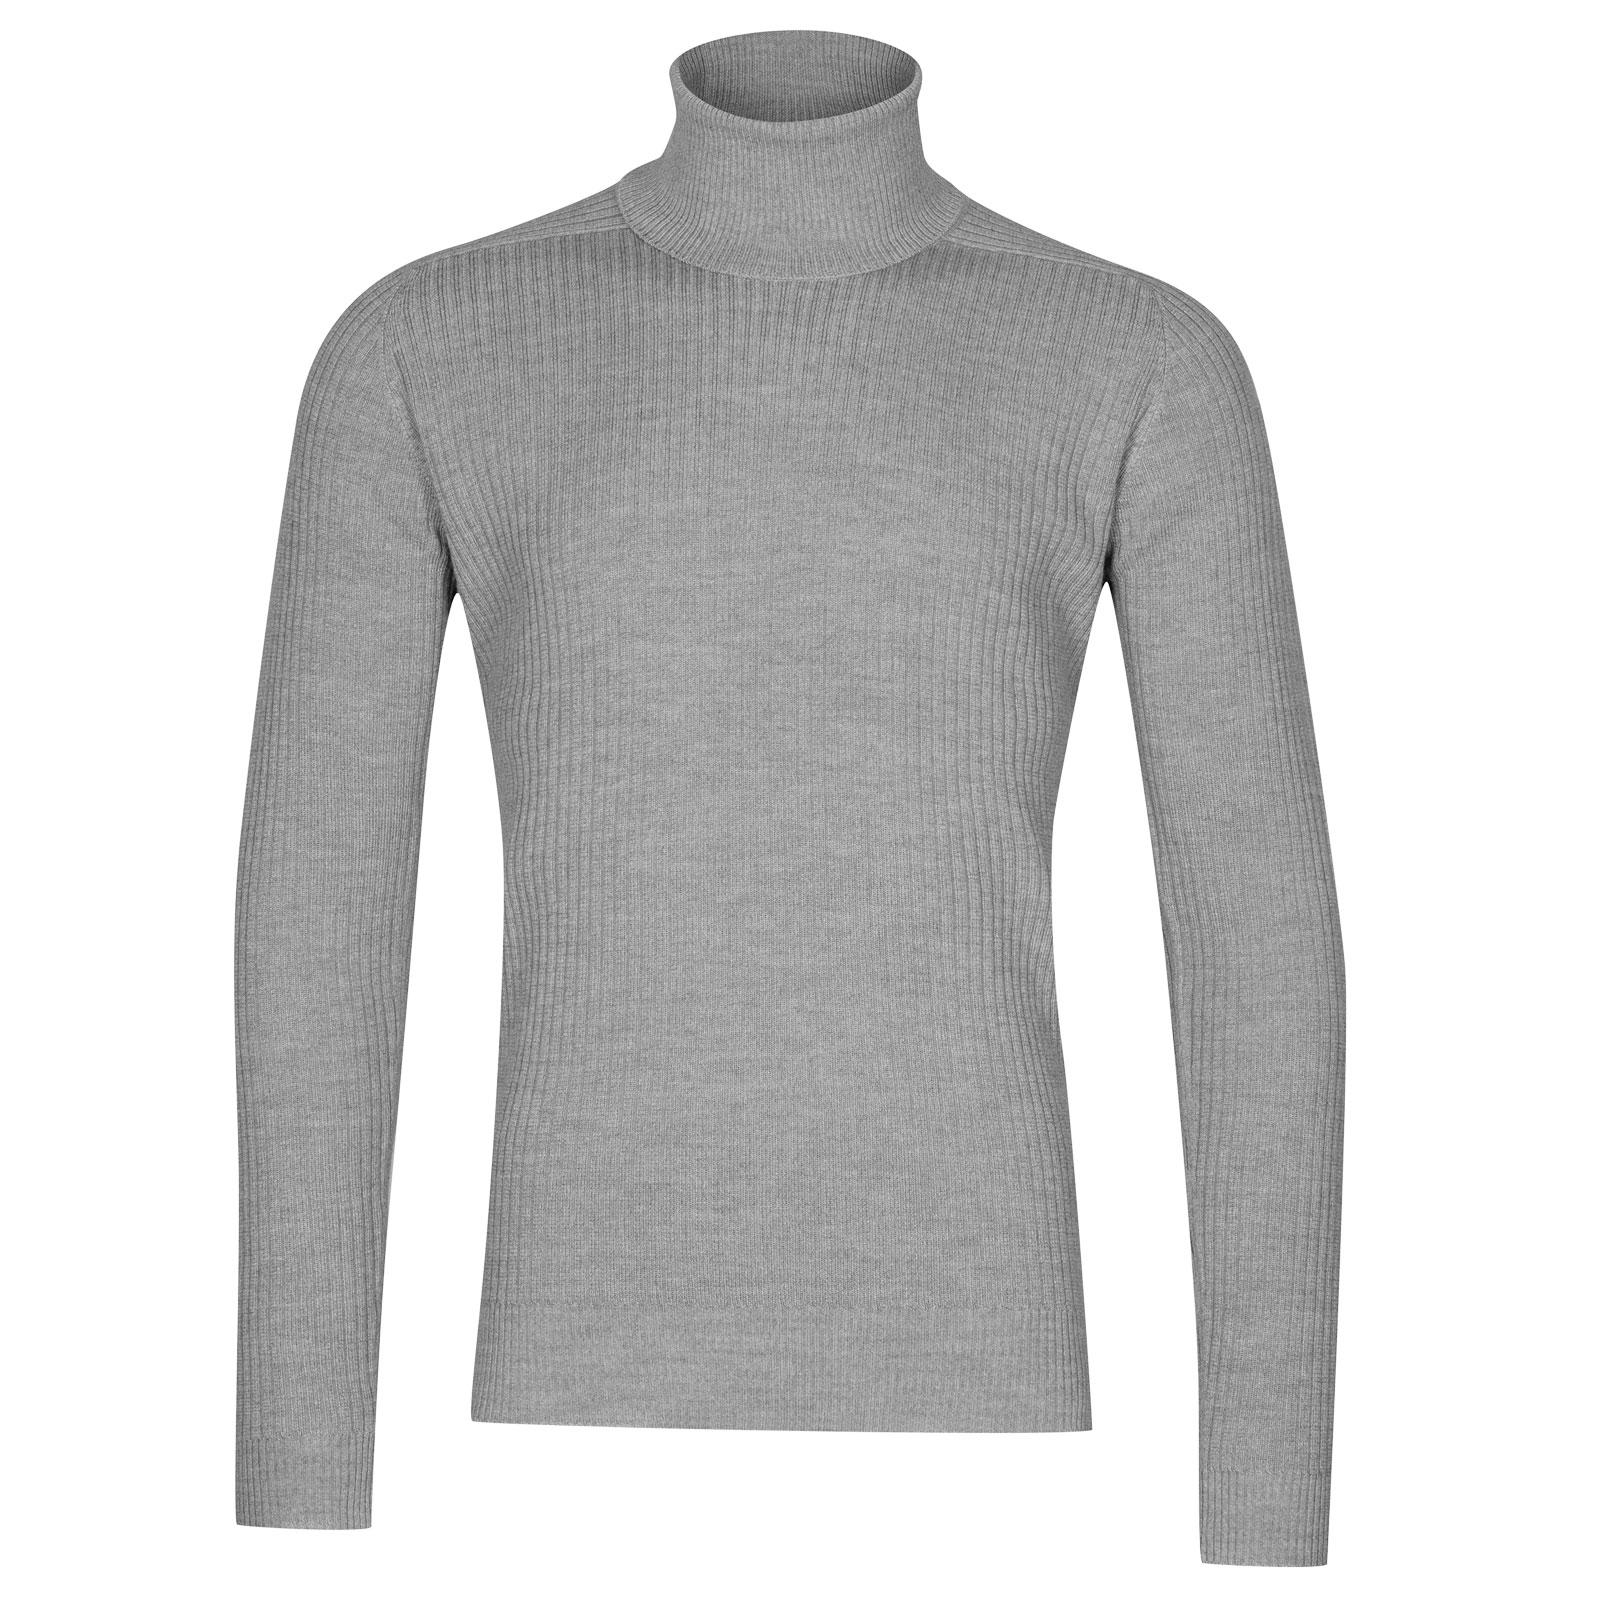 John Smedley redmayne Merino Wool Pullover in Bardot Grey-XXL